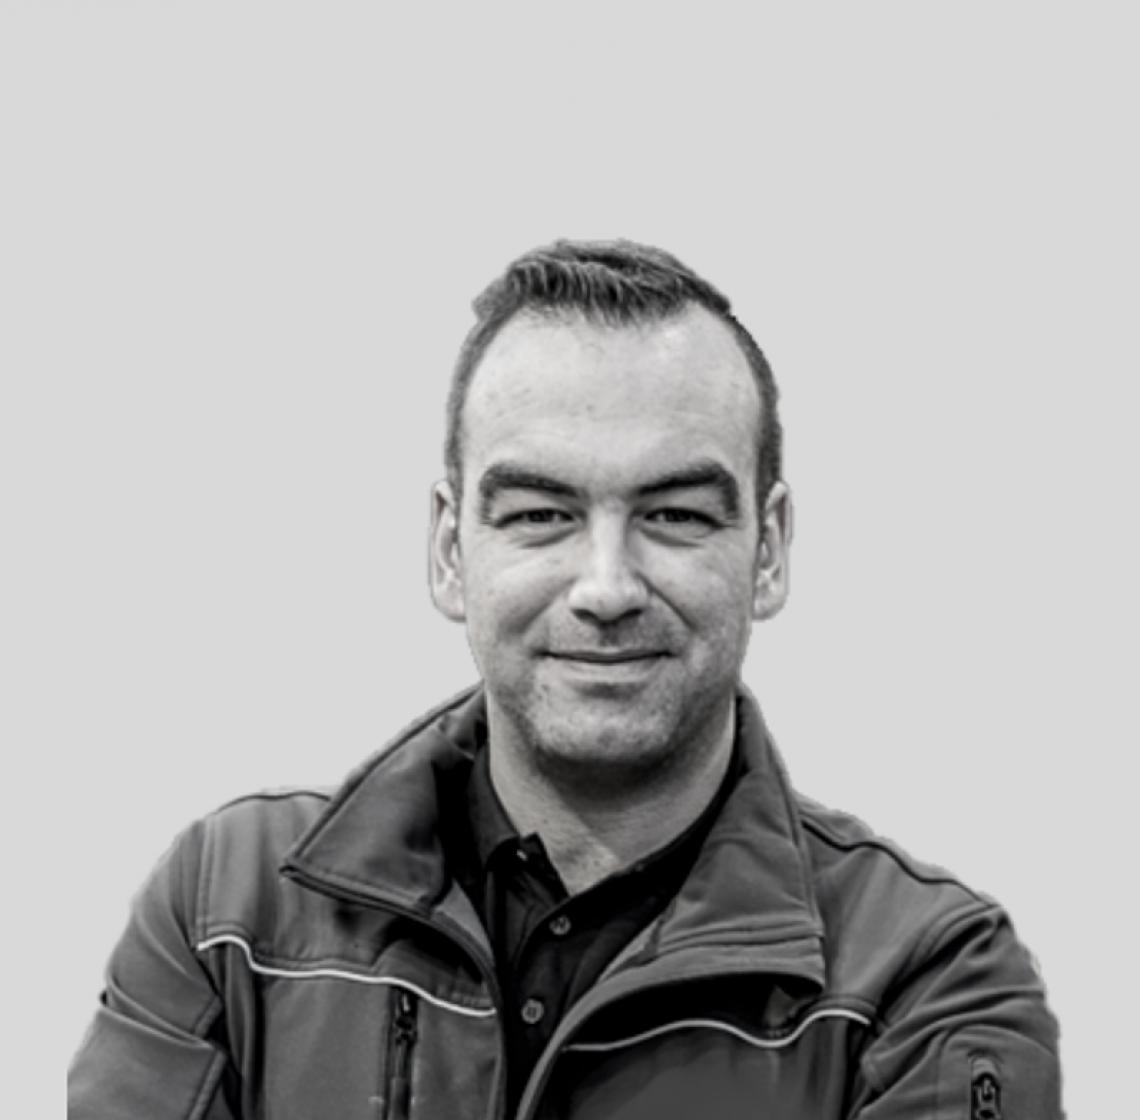 Fabrice Mazzarese